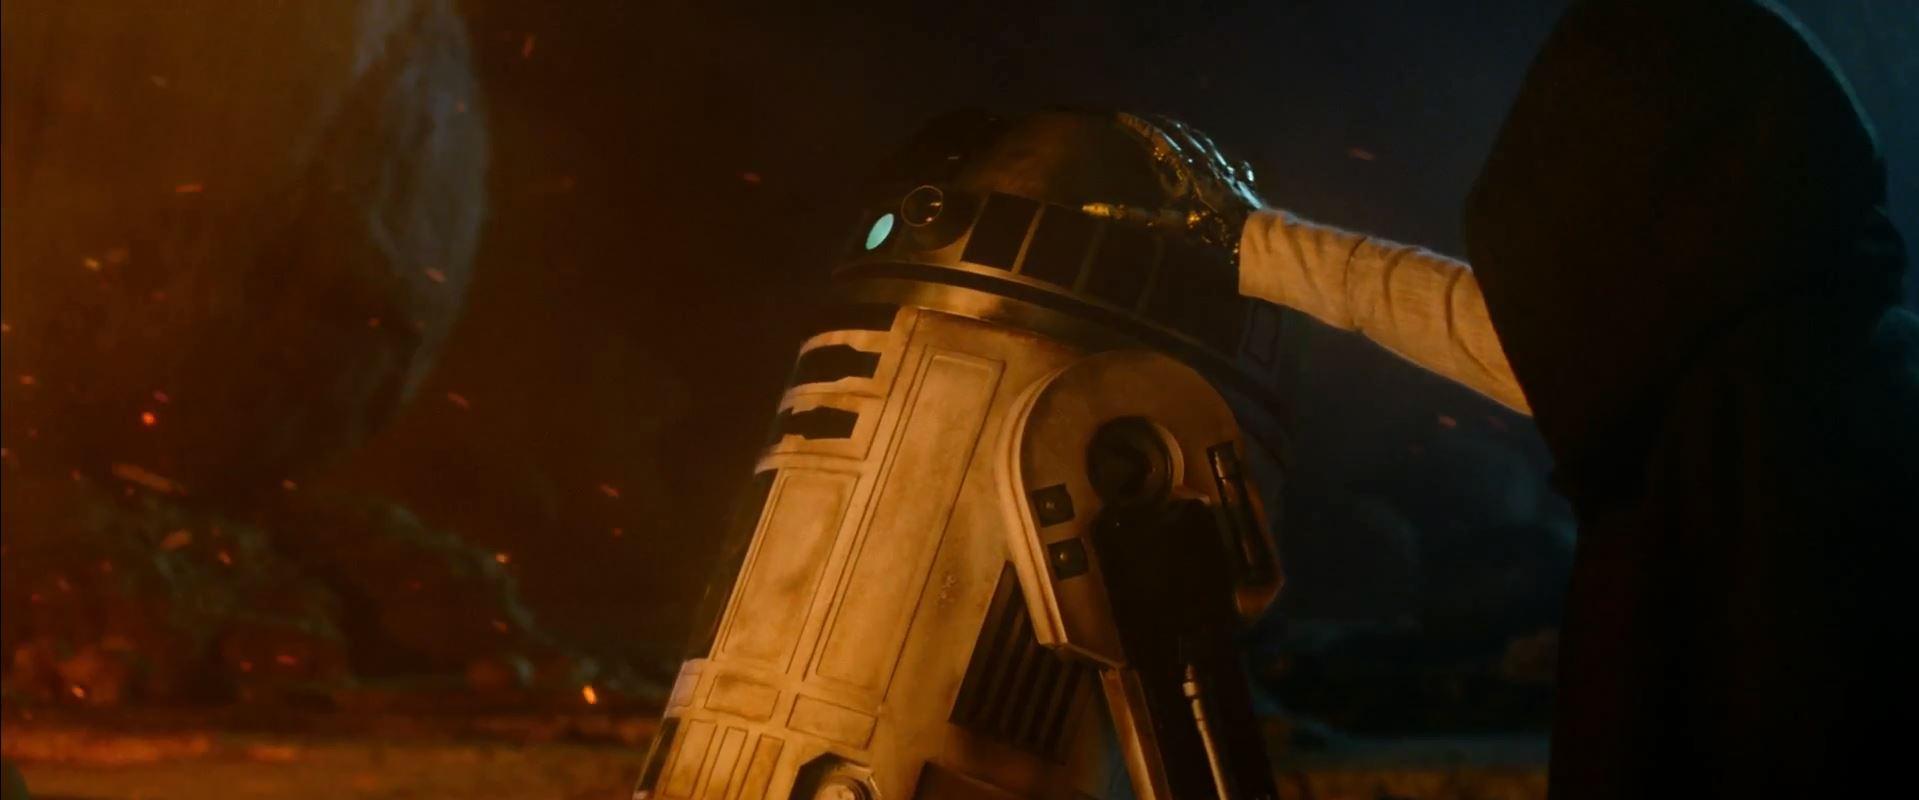 Luke Skywalker and R2D2. New Star Wars The Force Awakens Trailer Released!